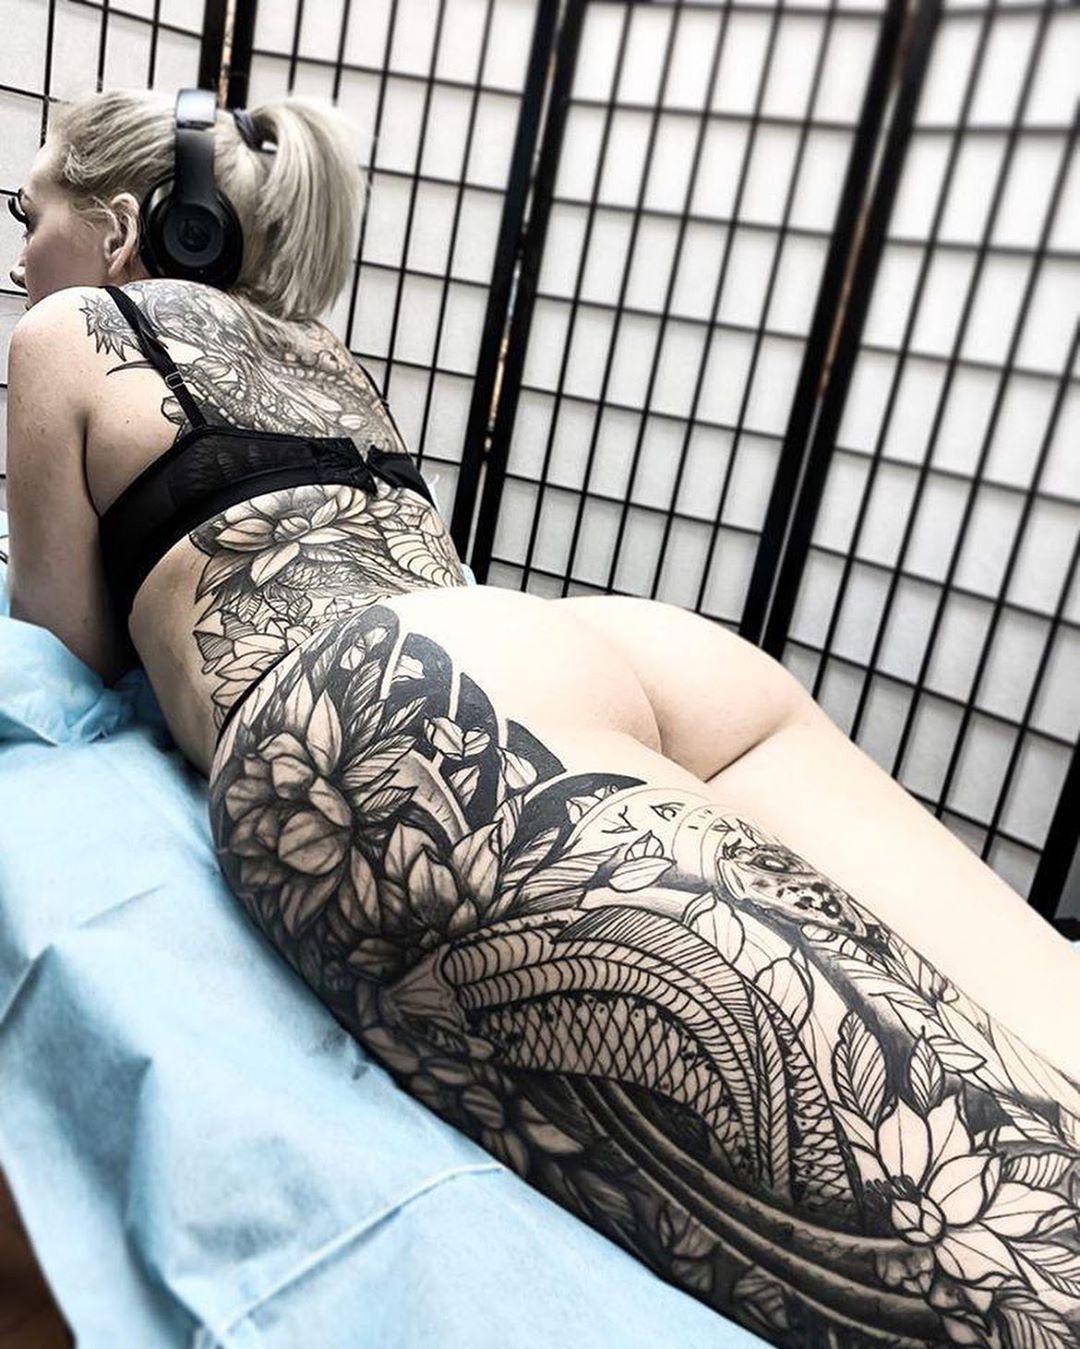 Follow this amazing tattoo artist @shorshjimenez @shorshjimenez | Las Vegas 🇺🇸 | Tag your friends! ➖➖➖➖➖➖➖➖➖➖➖➖➖ ⚊⚊⚊⚊⚊⚊⚊⚊⚊⚊⚊ All rights are reserved to their rightful owner (s) ⚊⚊⚊⚊⚊⚊⚊⚊⚊⚊⚊ #art #tattoos #tattoo #ink #inked #inkaddict #inkspiration #tattooed #smalltattoo #inkaddicted #cutetattoo #amazingtattoo #tattoolover #tattooedgirls #tattooedwomen #tattooflash #tatts #tattooist #tattoolife #tattoolifestyle #tattoolove #amazingink #tattoostagram #tattooinspiration #inkaholik #tattoowork #ta